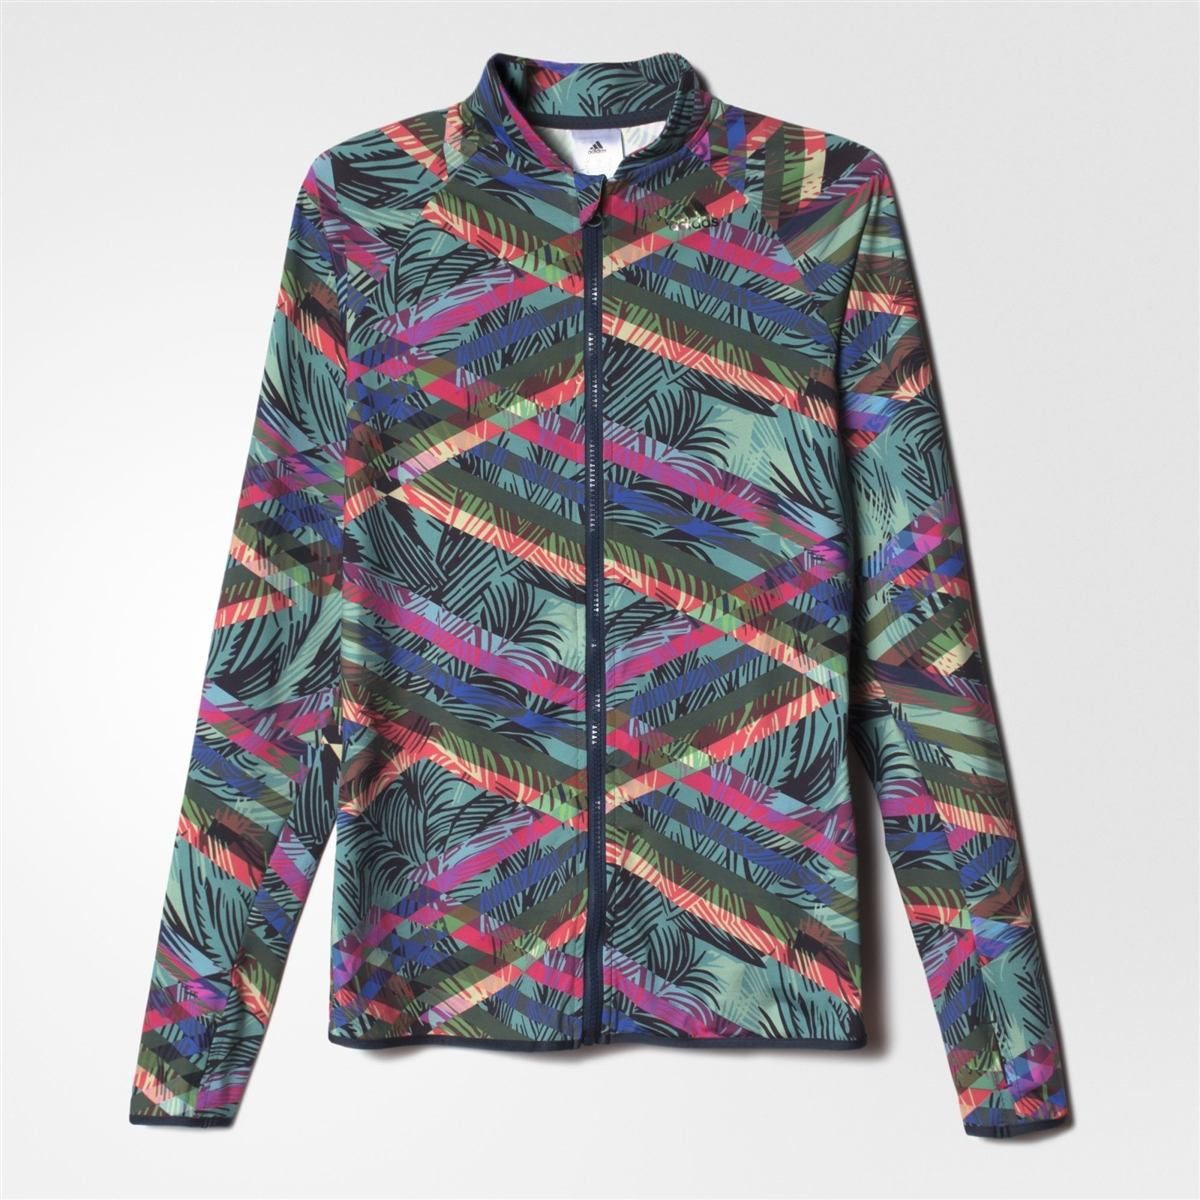 2ba3d638dff jaqueta adidas salinas feminina original + nota fiscal. Carregando zoom.